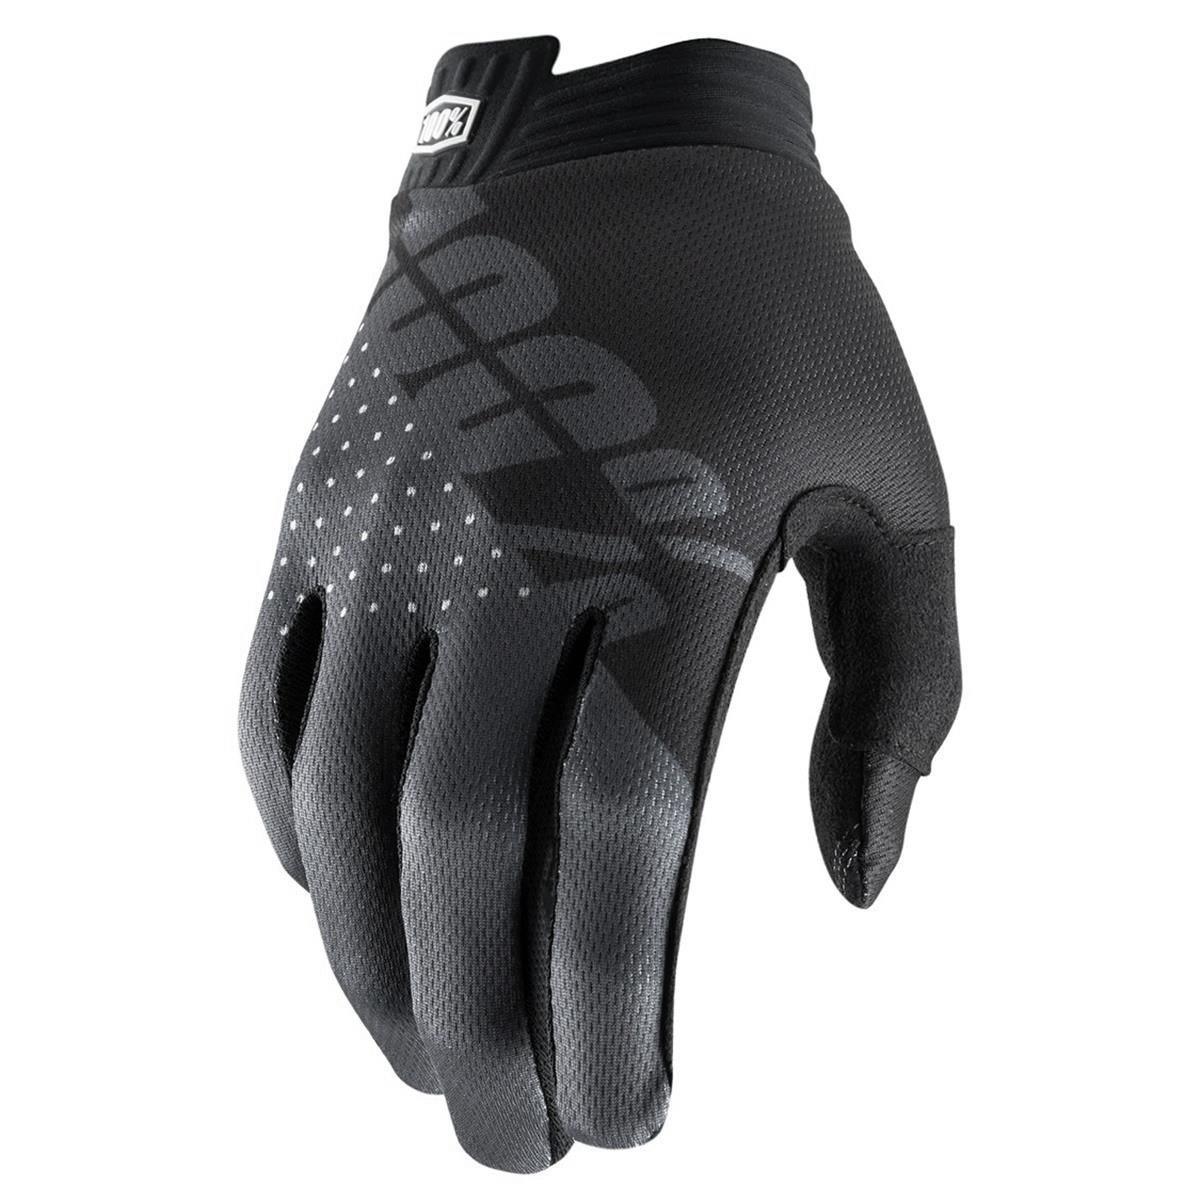 100% Kids Handschuhe iTrack Schwarz/Charcoal